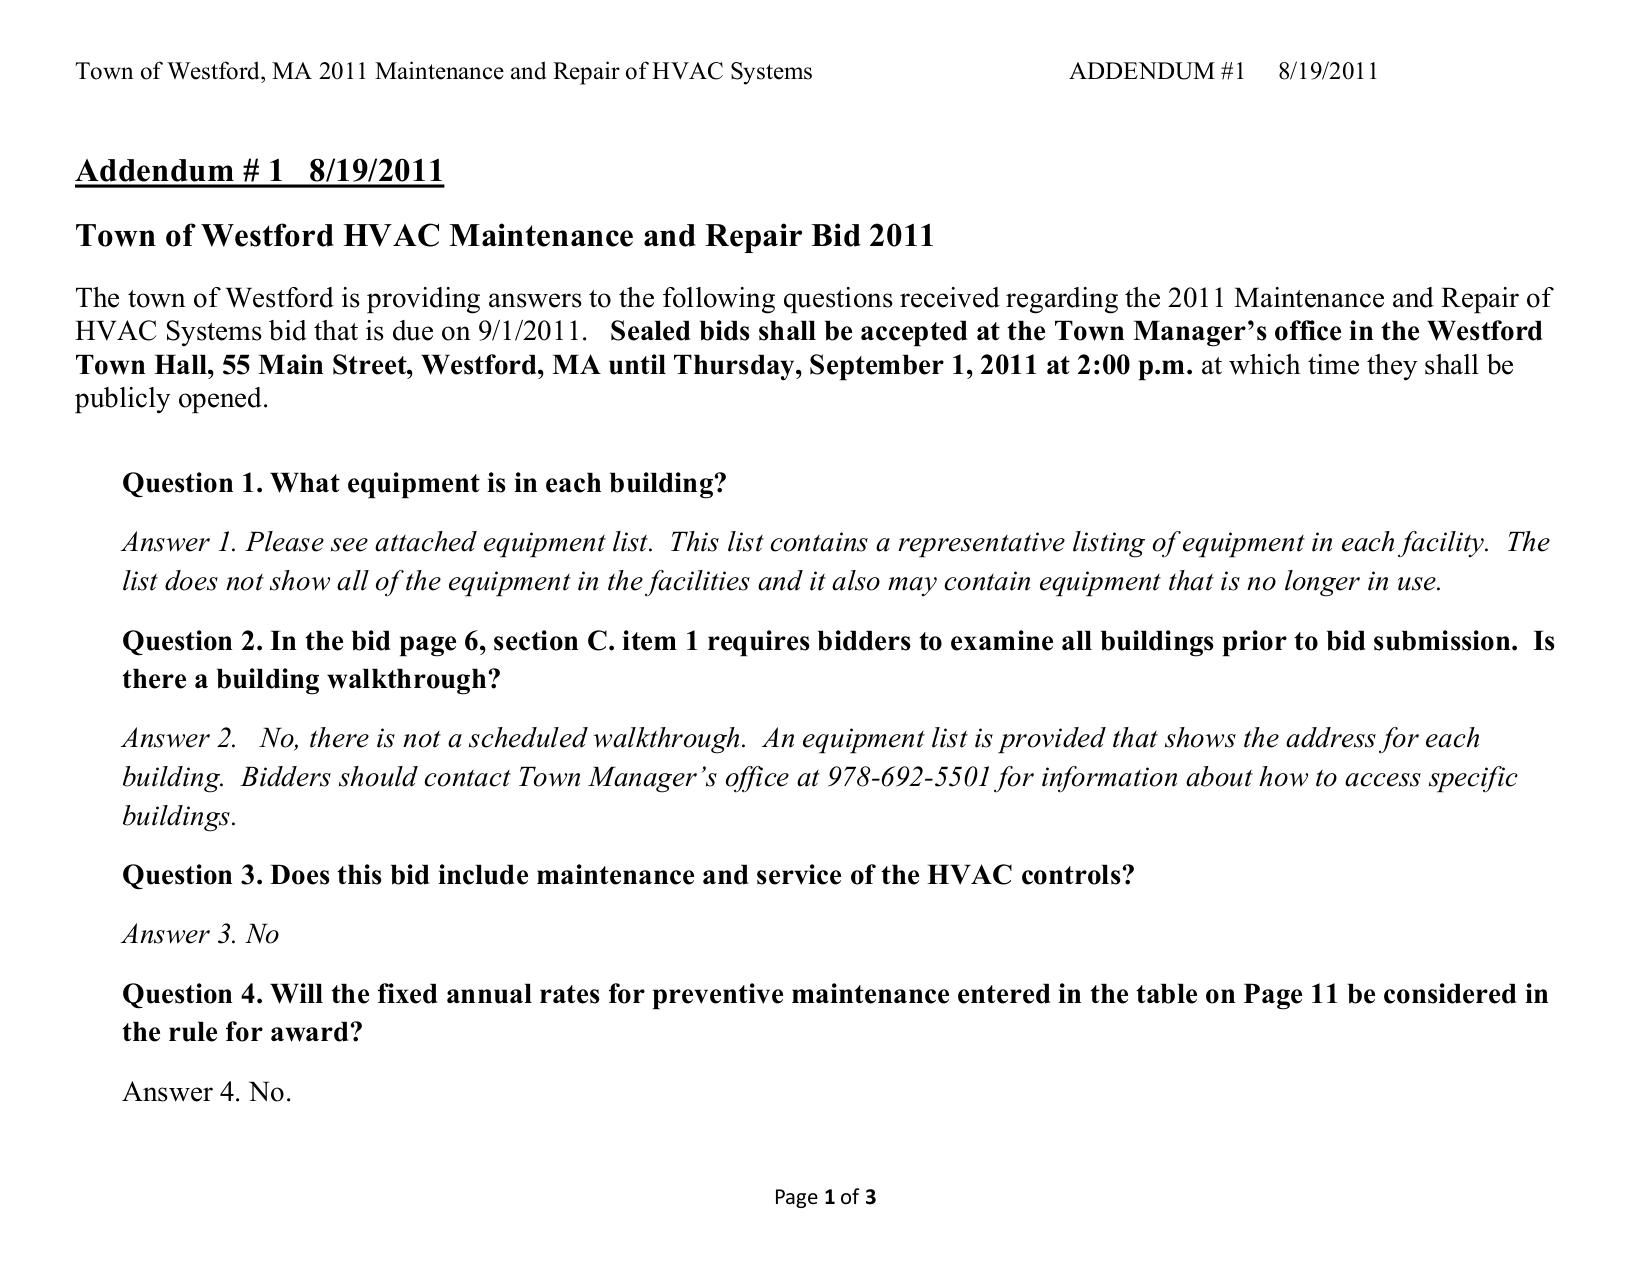 Air Conditioner > LP1311BXR #444444